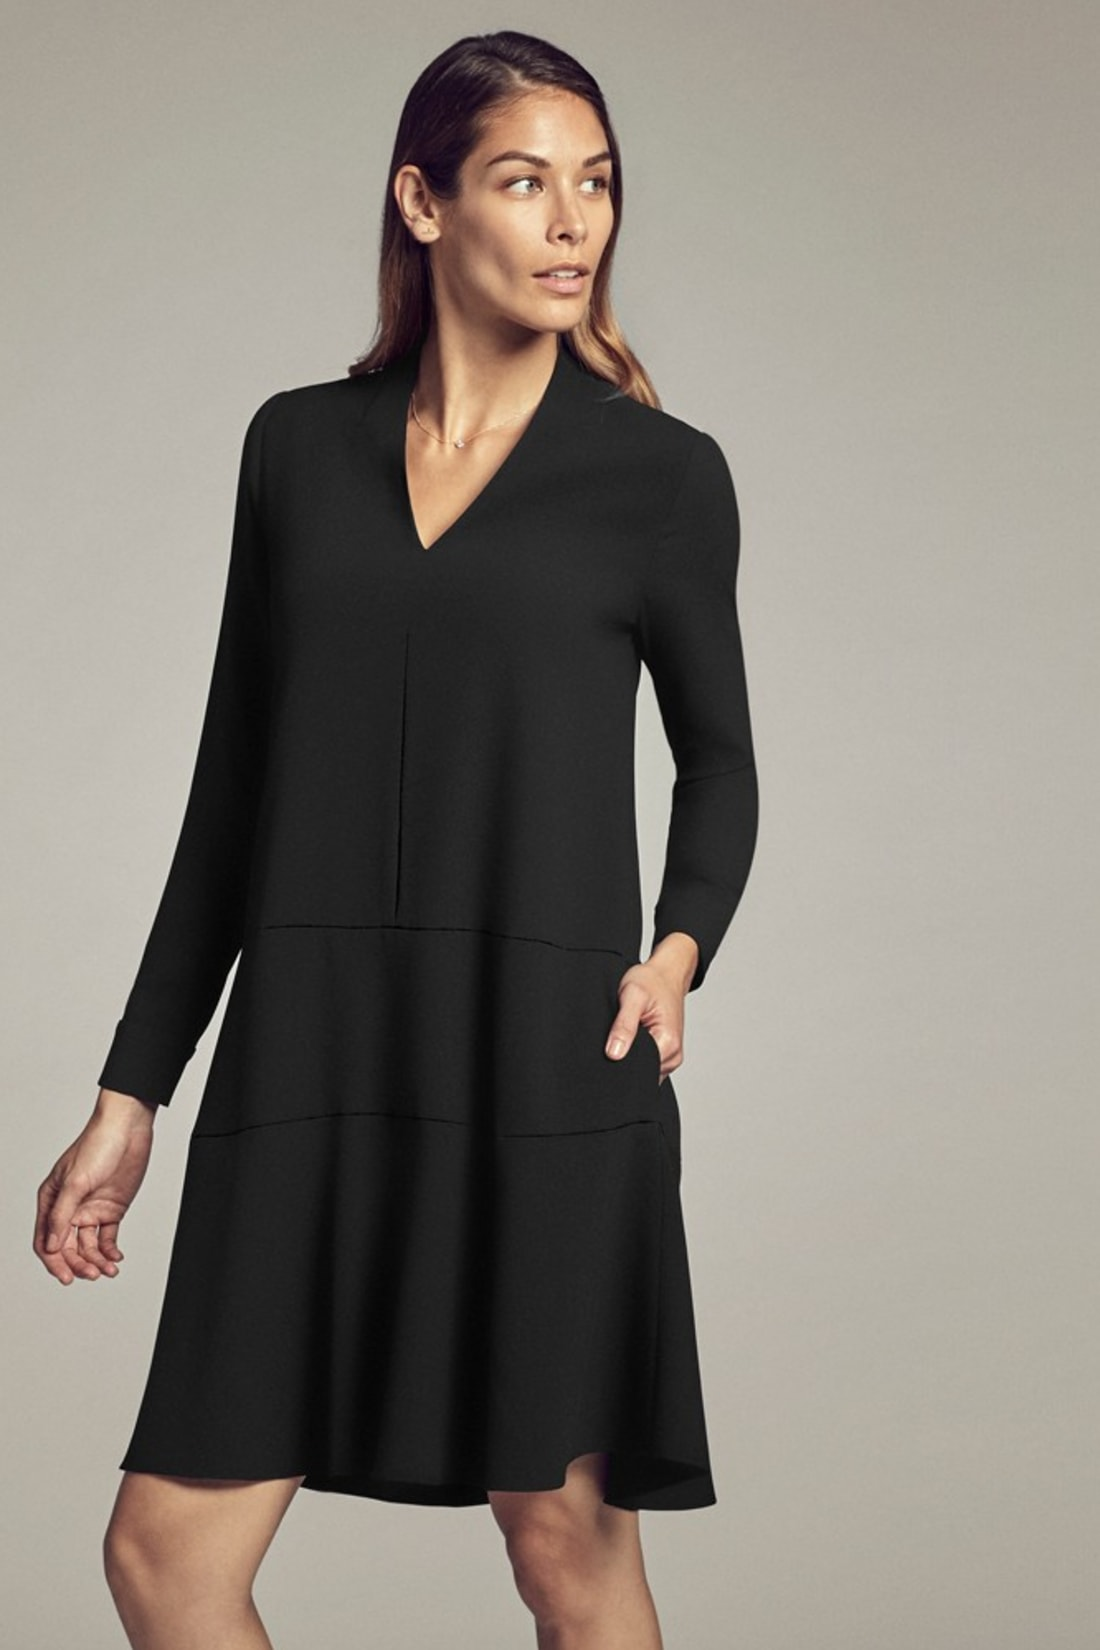 Black dress elle - 1